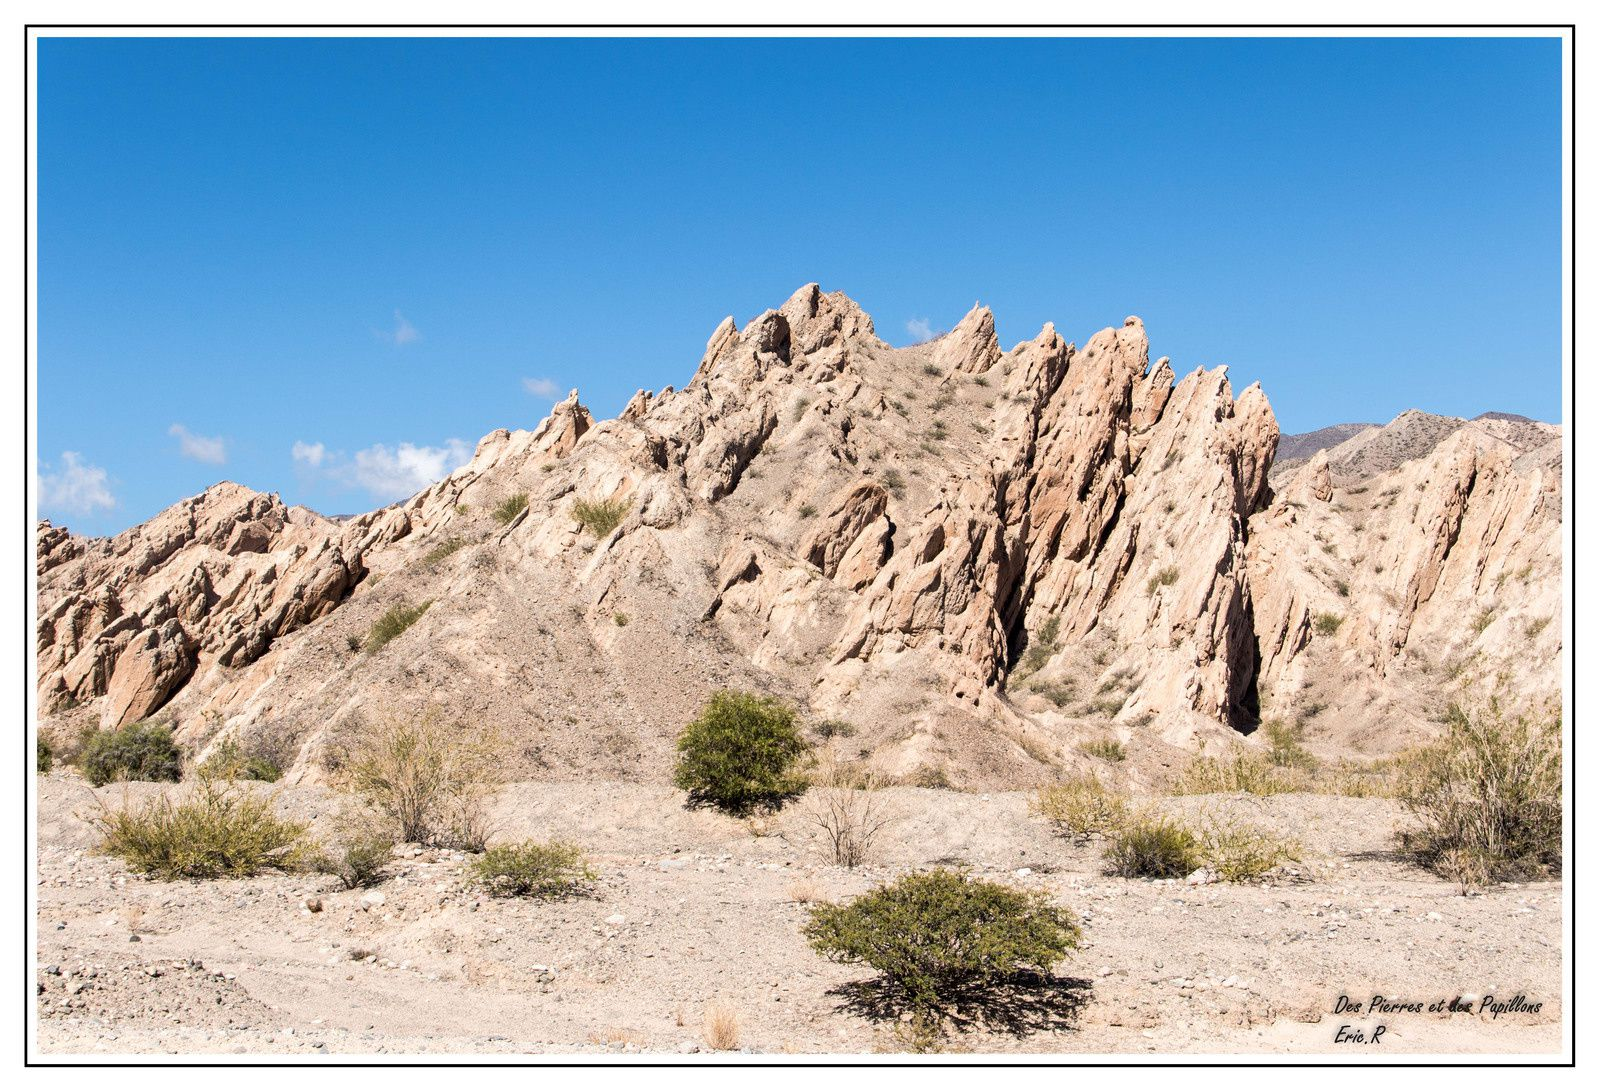 Images de la vallée des Flèches - Quebrada de las flechas.